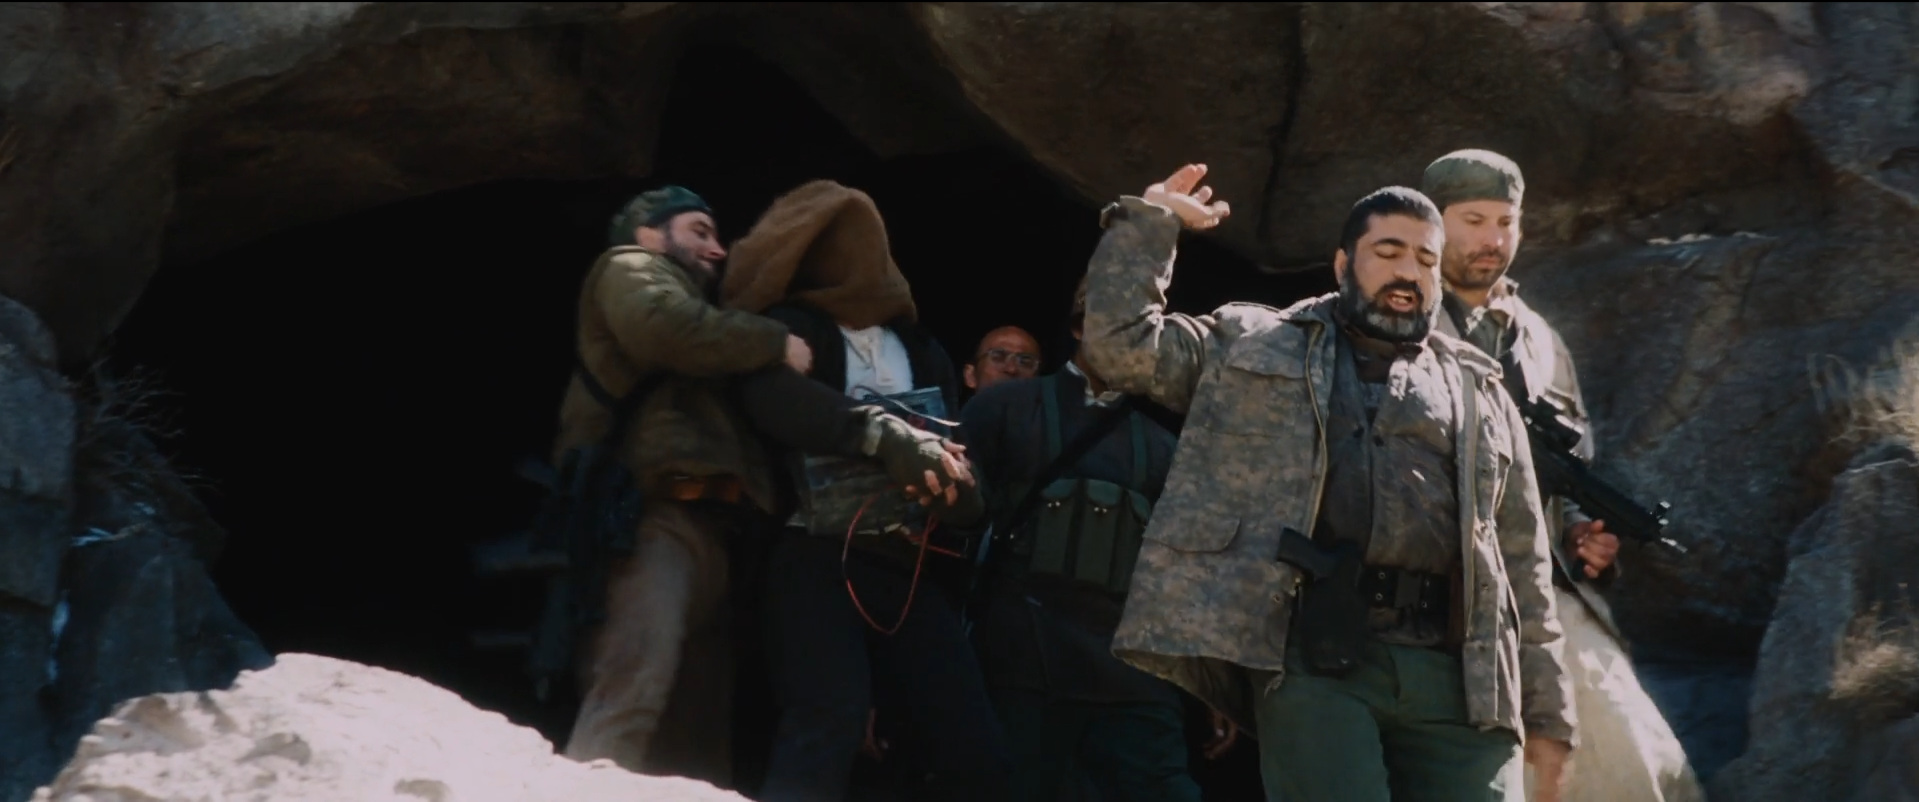 Iron Man  (2008): Afghanistan as threat